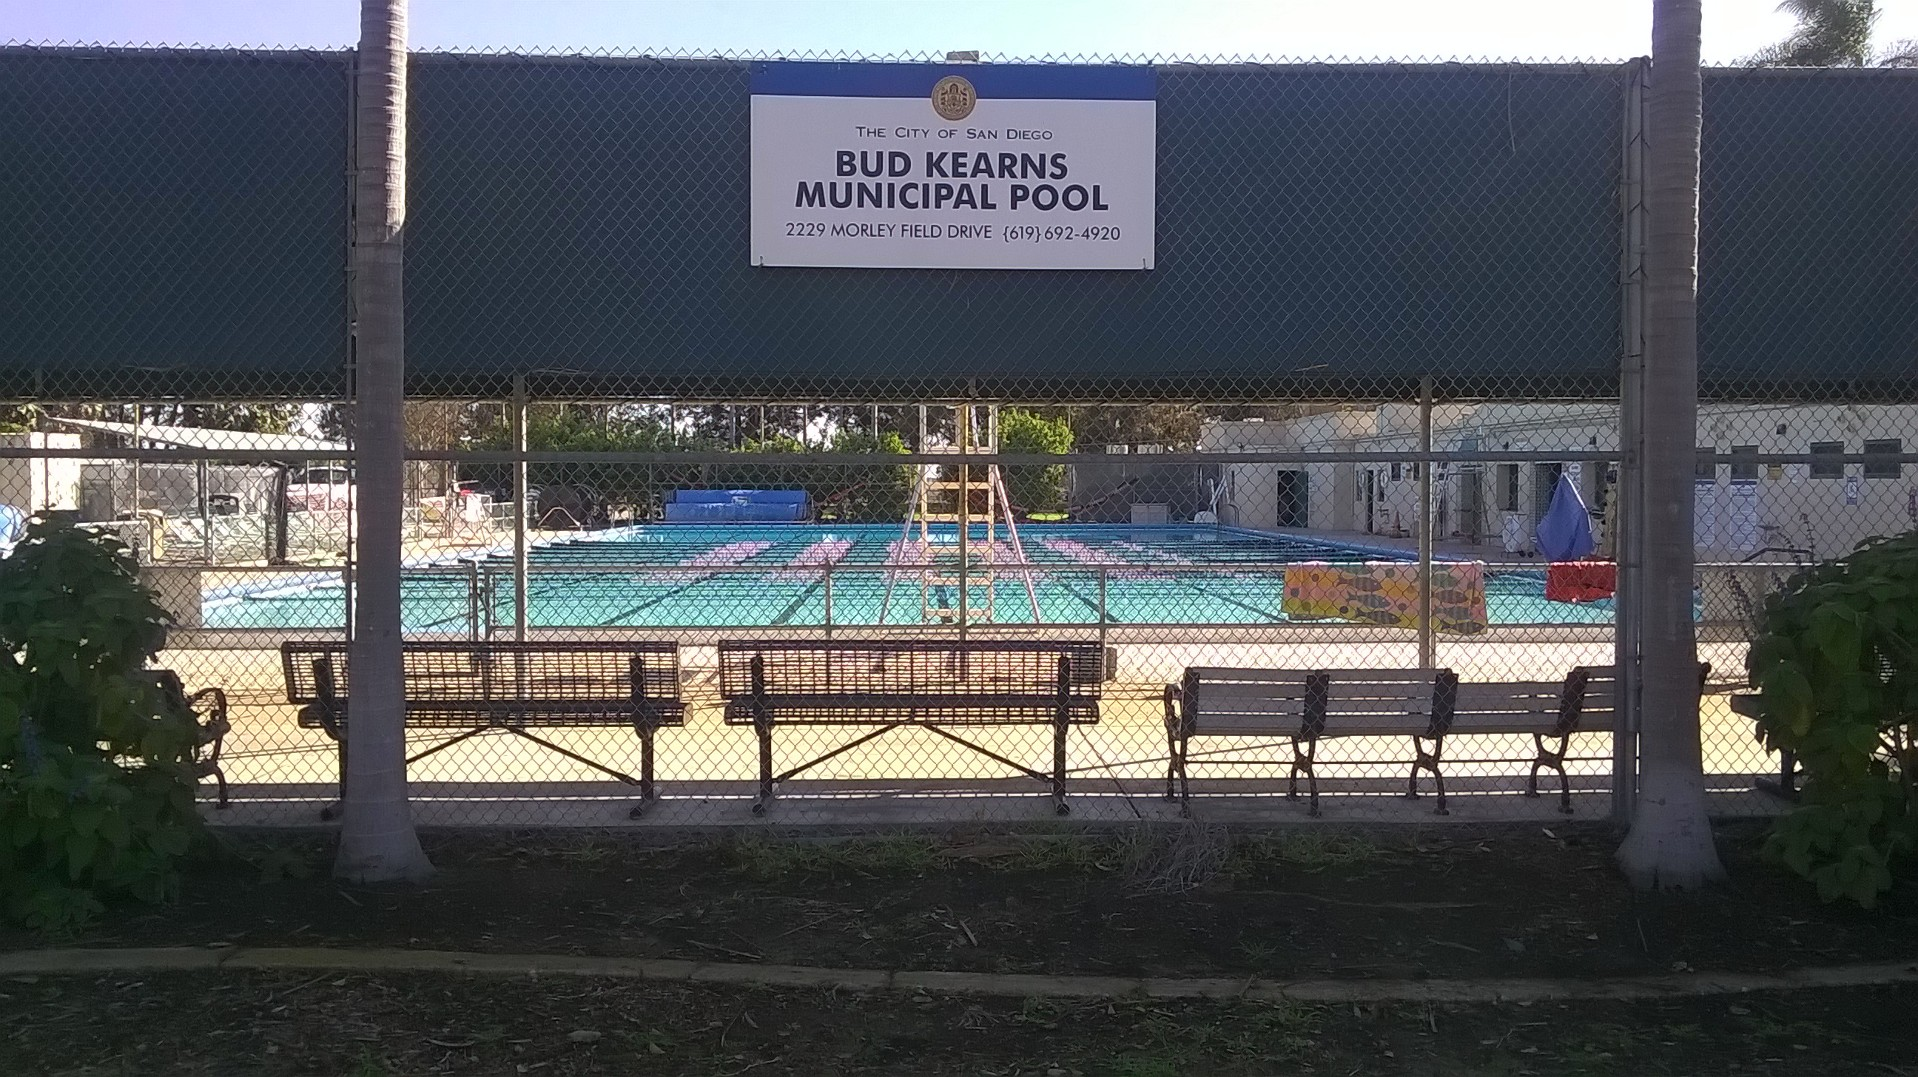 0229 - Bud Kearns Municipal Pool - San Diego